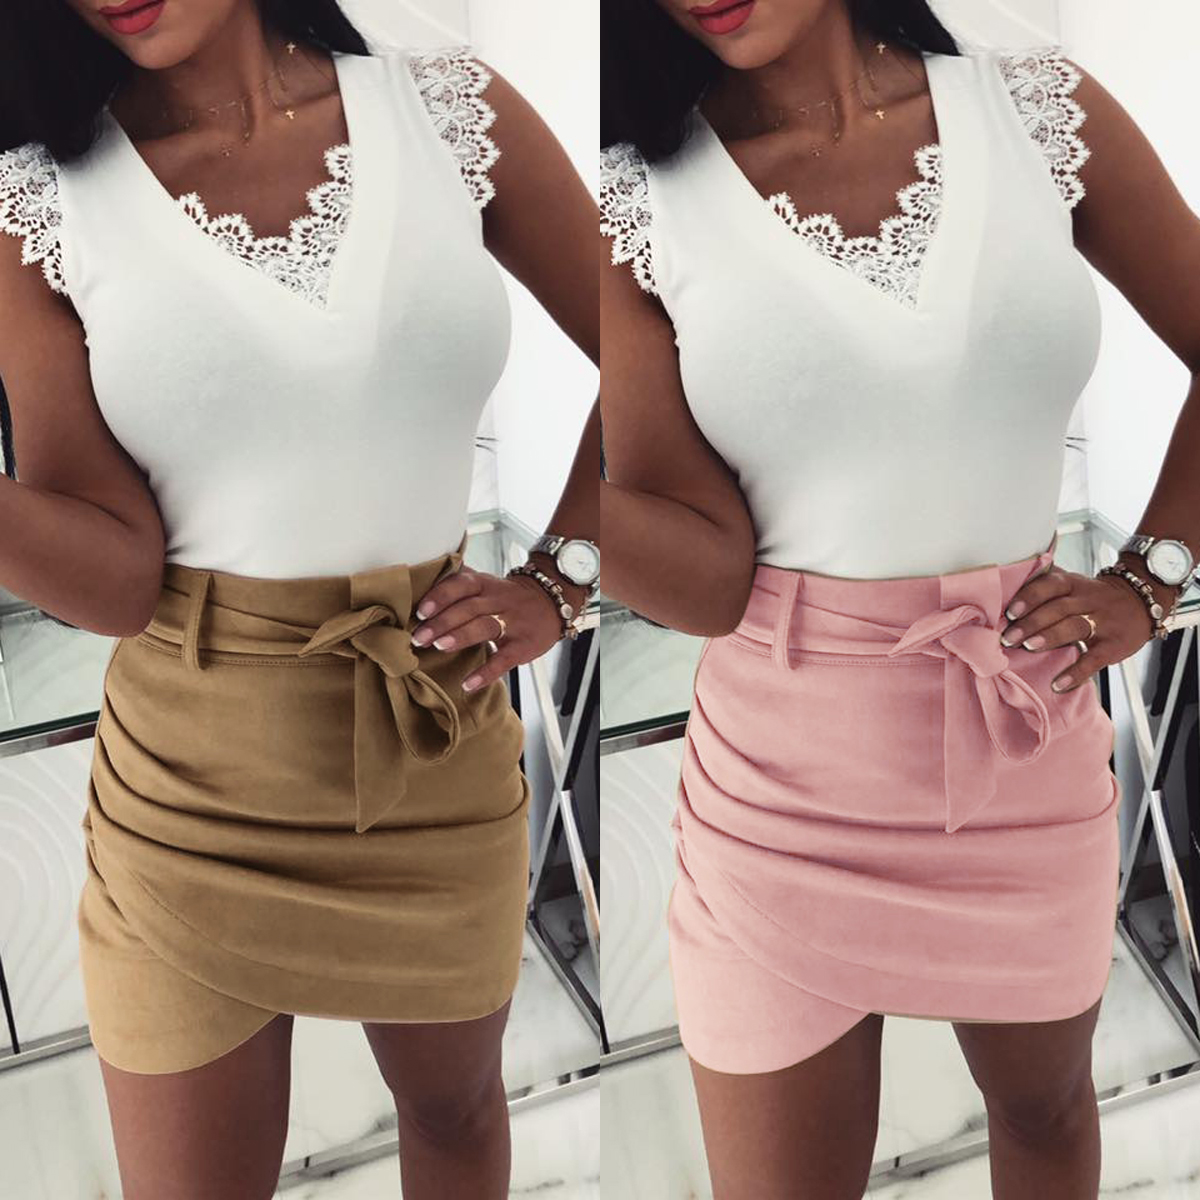 Hot Ladies Skirt Autumn Fashion Womens Mini Skirts Sexy Bandage Clubwear High Waist Pencil Cross Skirt White Pink Khak